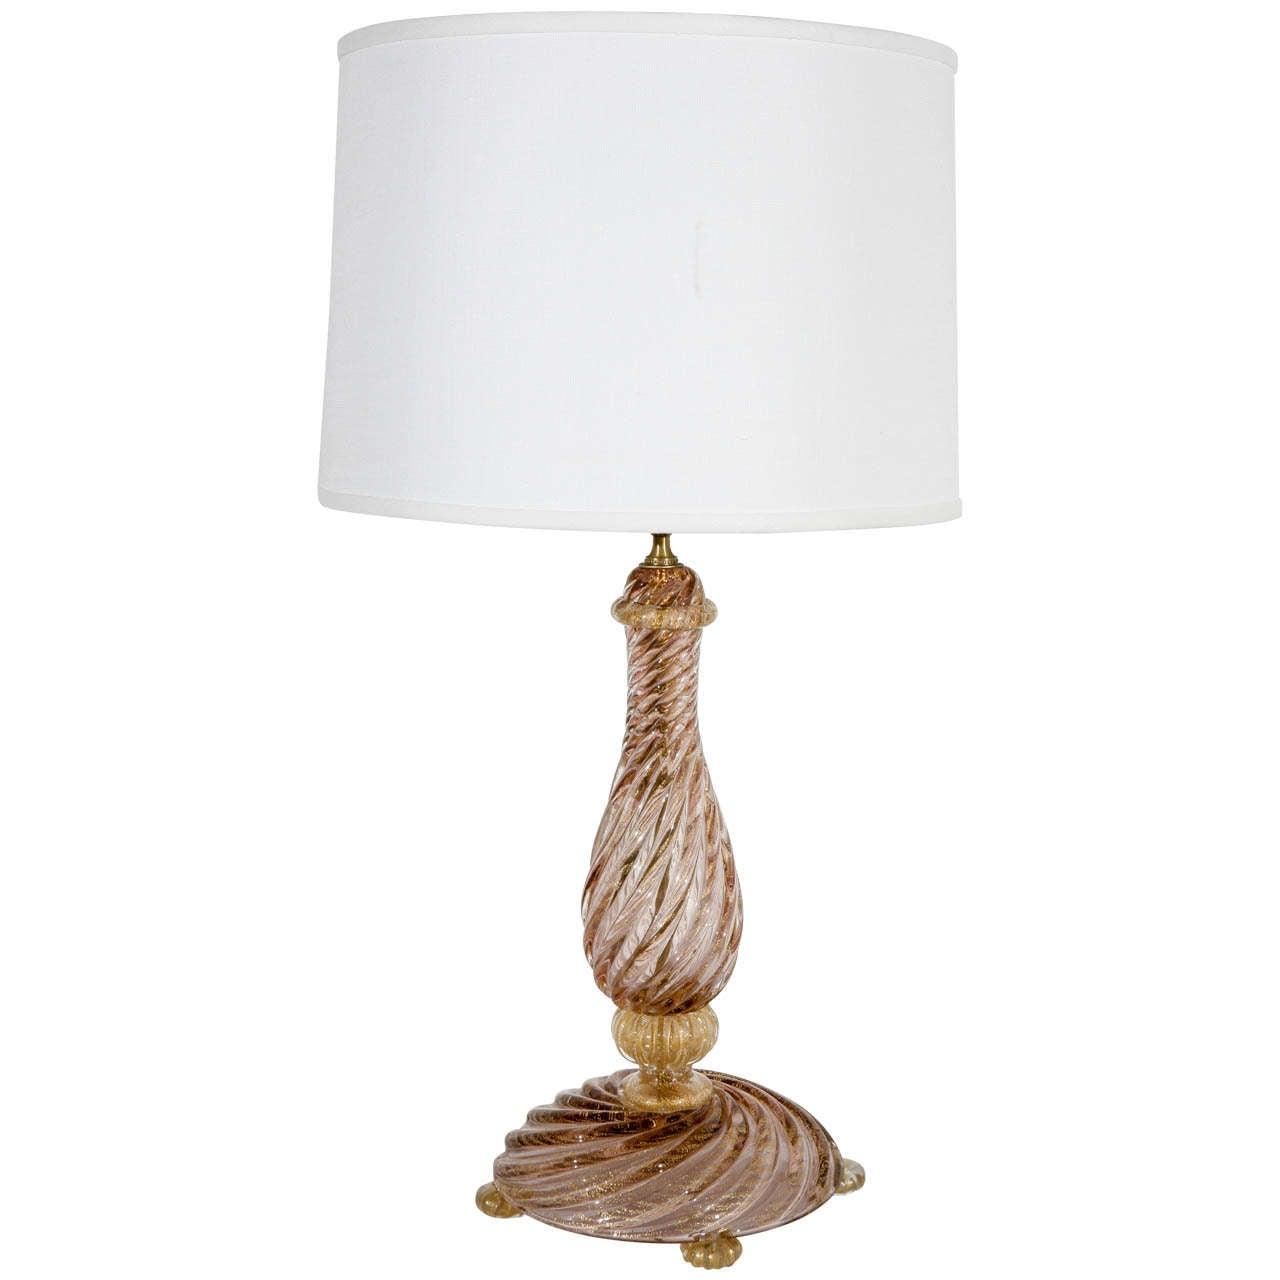 vintage murano glass table lamp. Black Bedroom Furniture Sets. Home Design Ideas